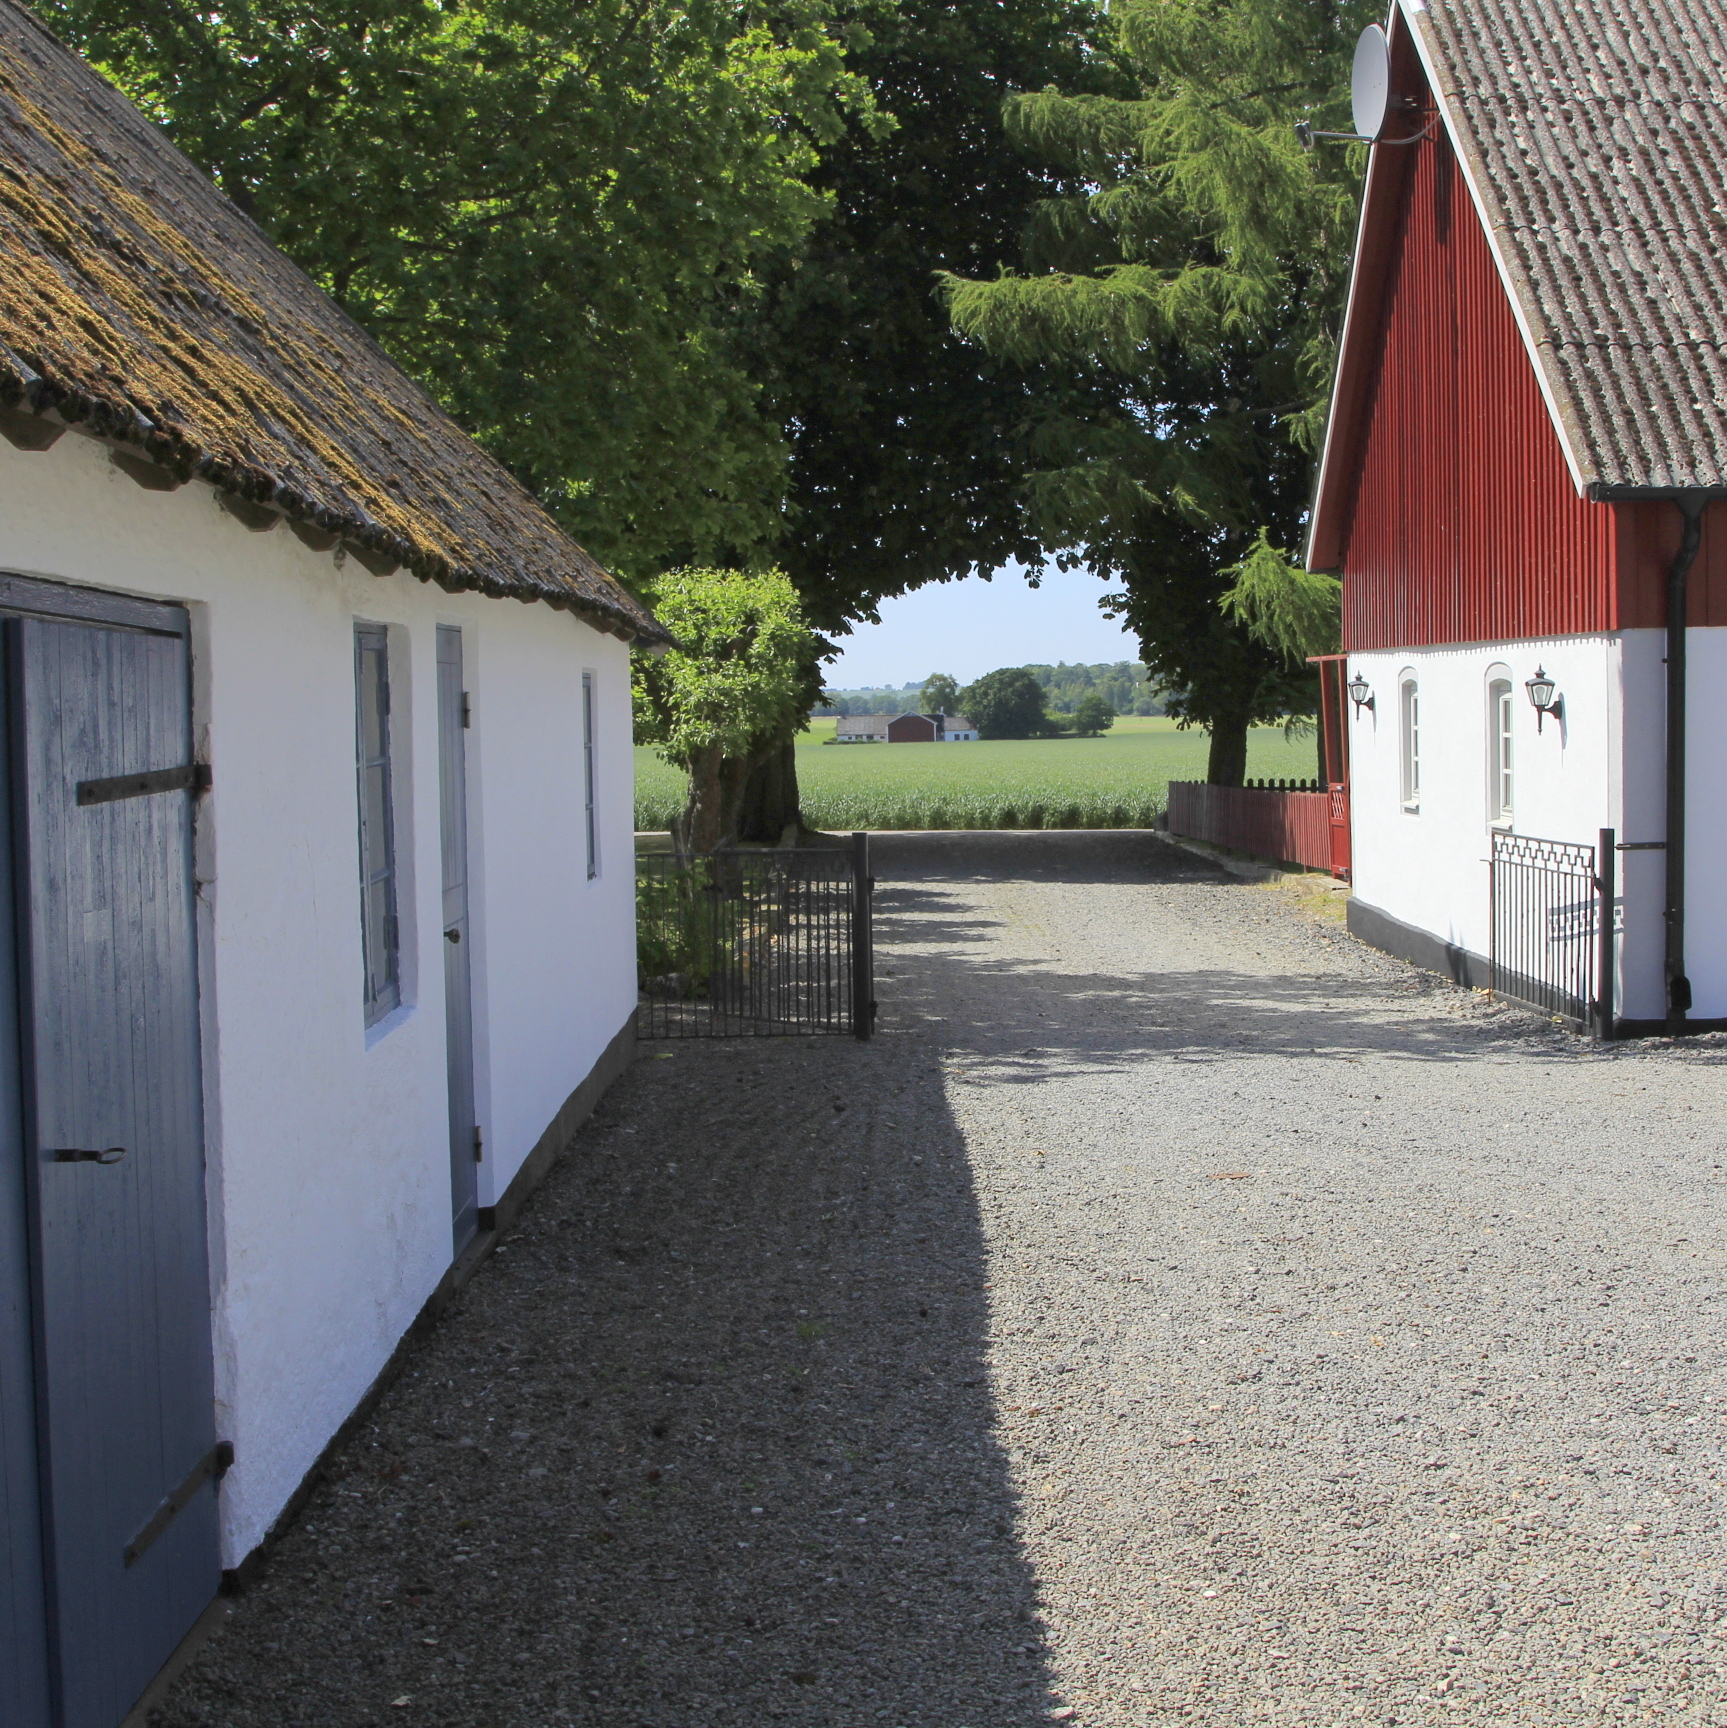 Lillehem_Gårdshotell_Sydkusten_Skåne_302